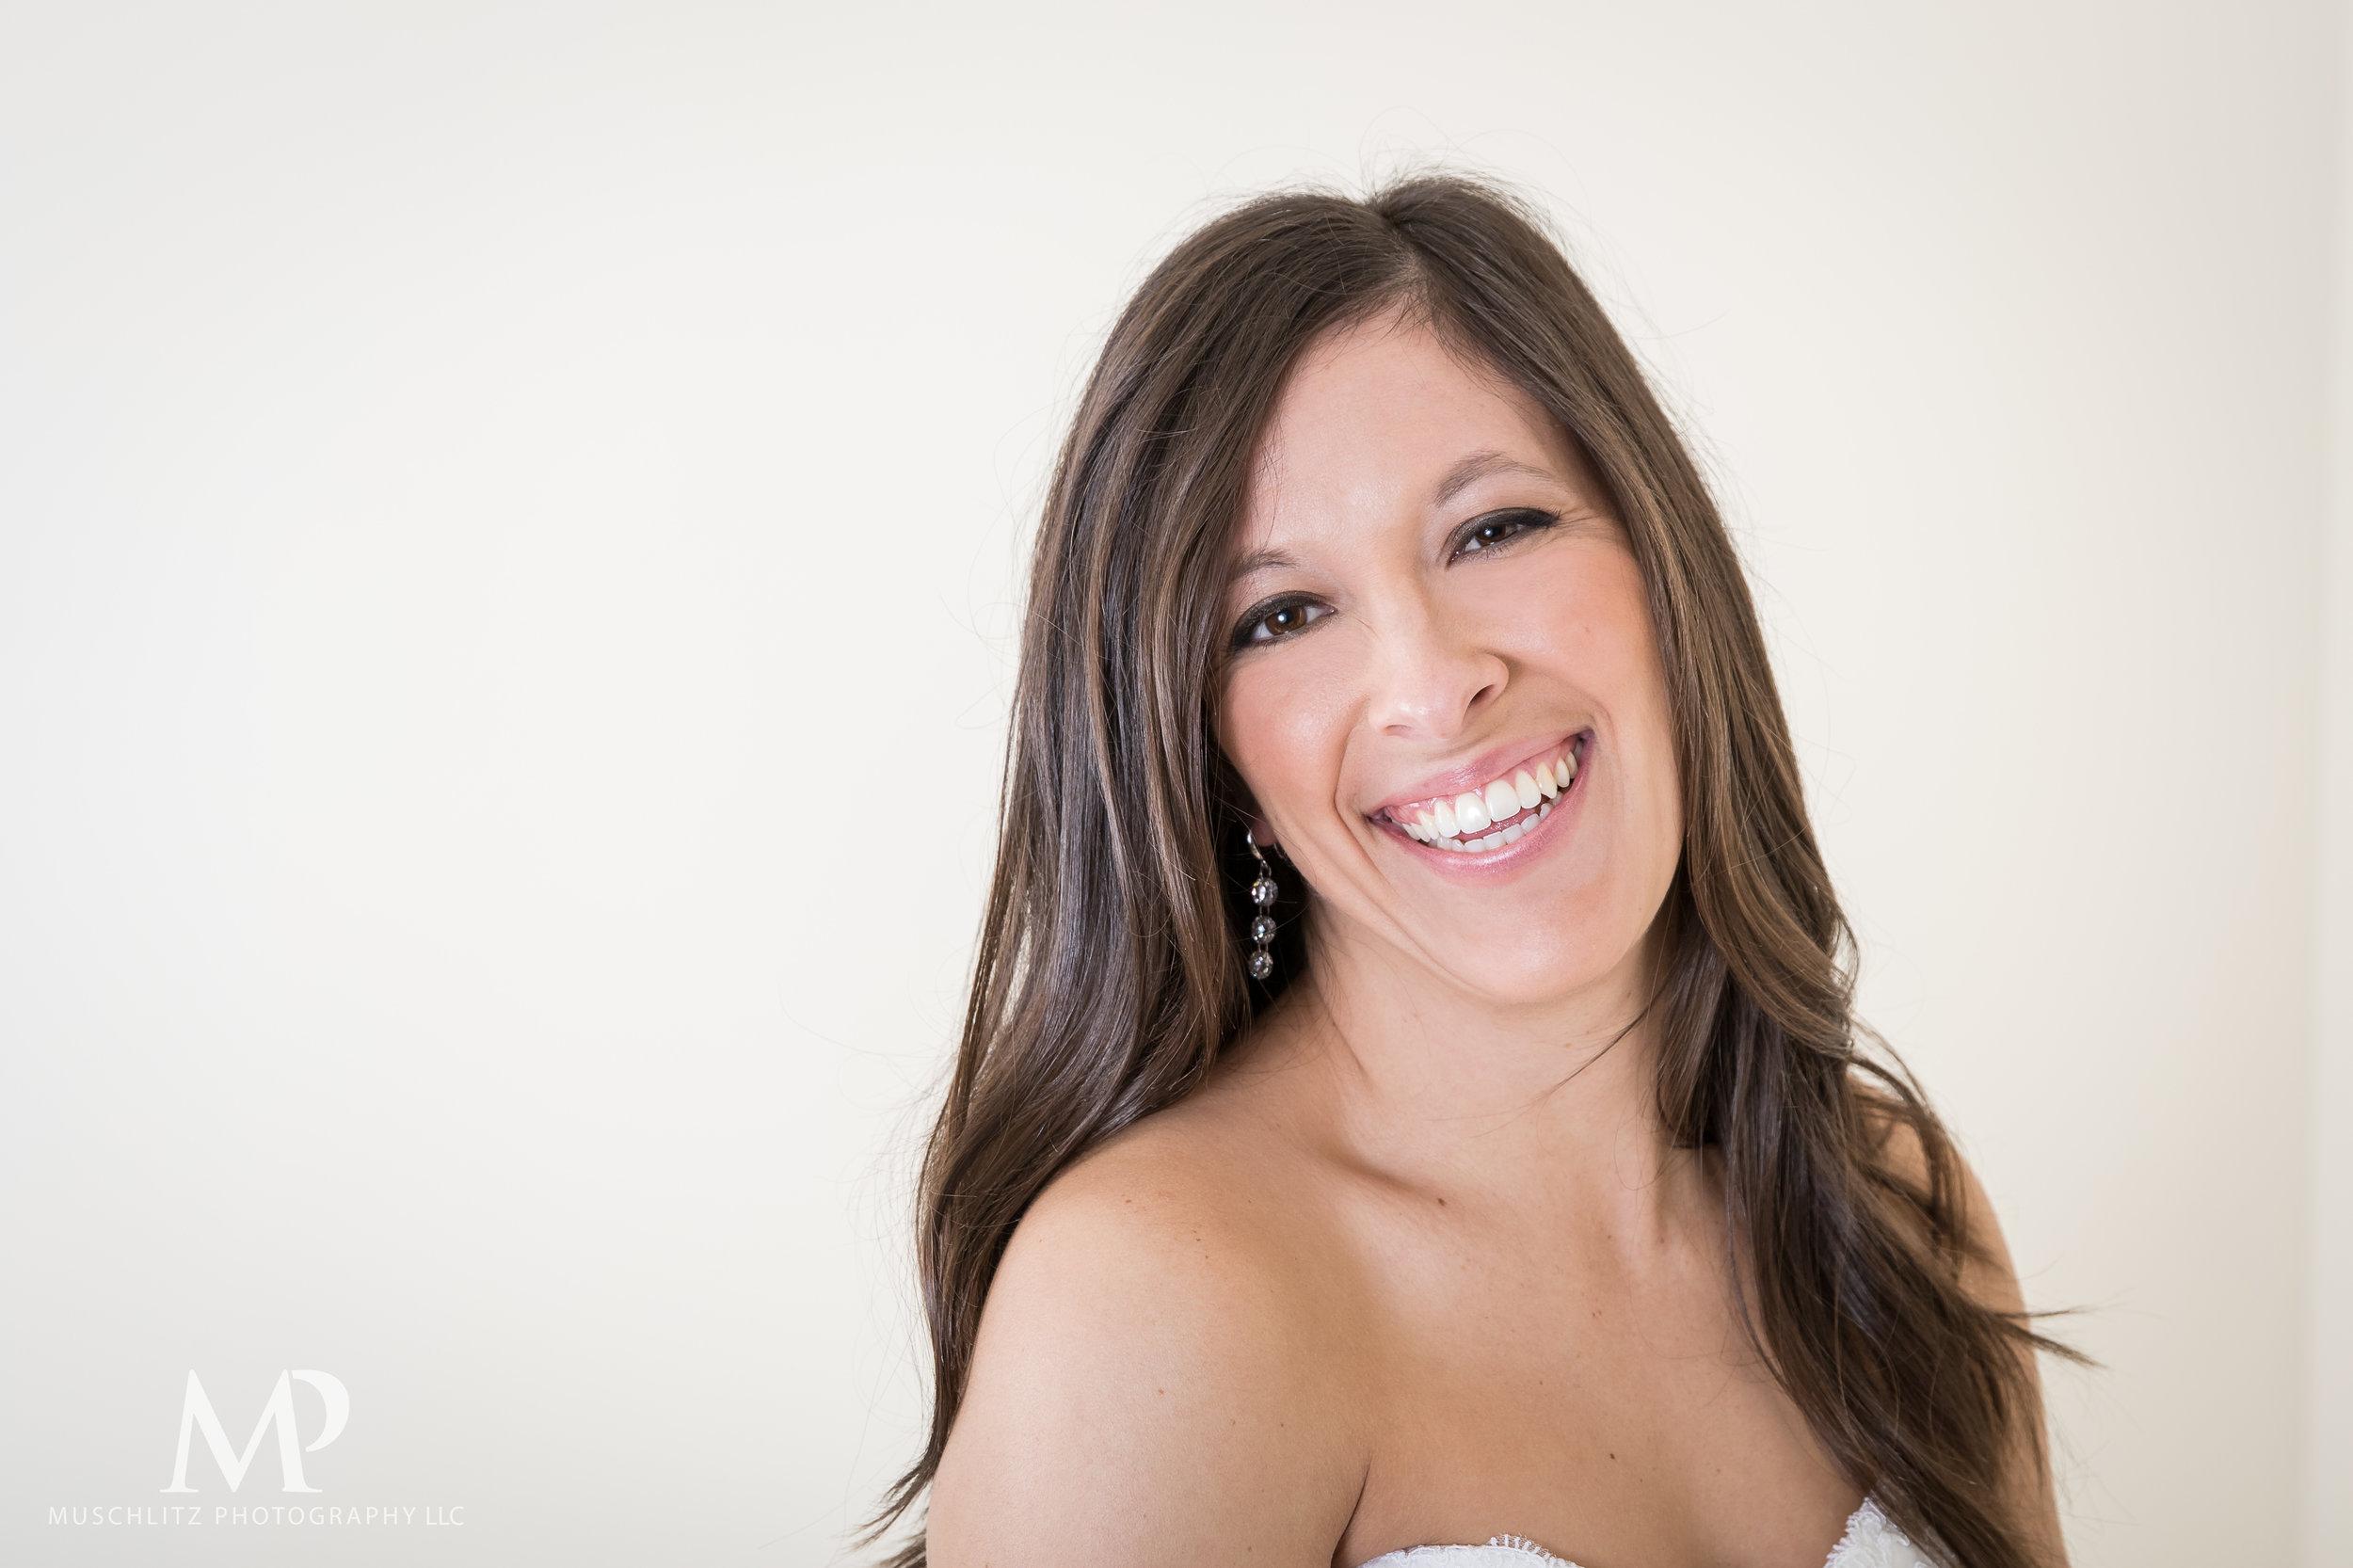 beauty-bridal-glam-the-dress-portraits-photographer-studio-columbus-ohio-gahanna-muschlitz-photography-016.JPG